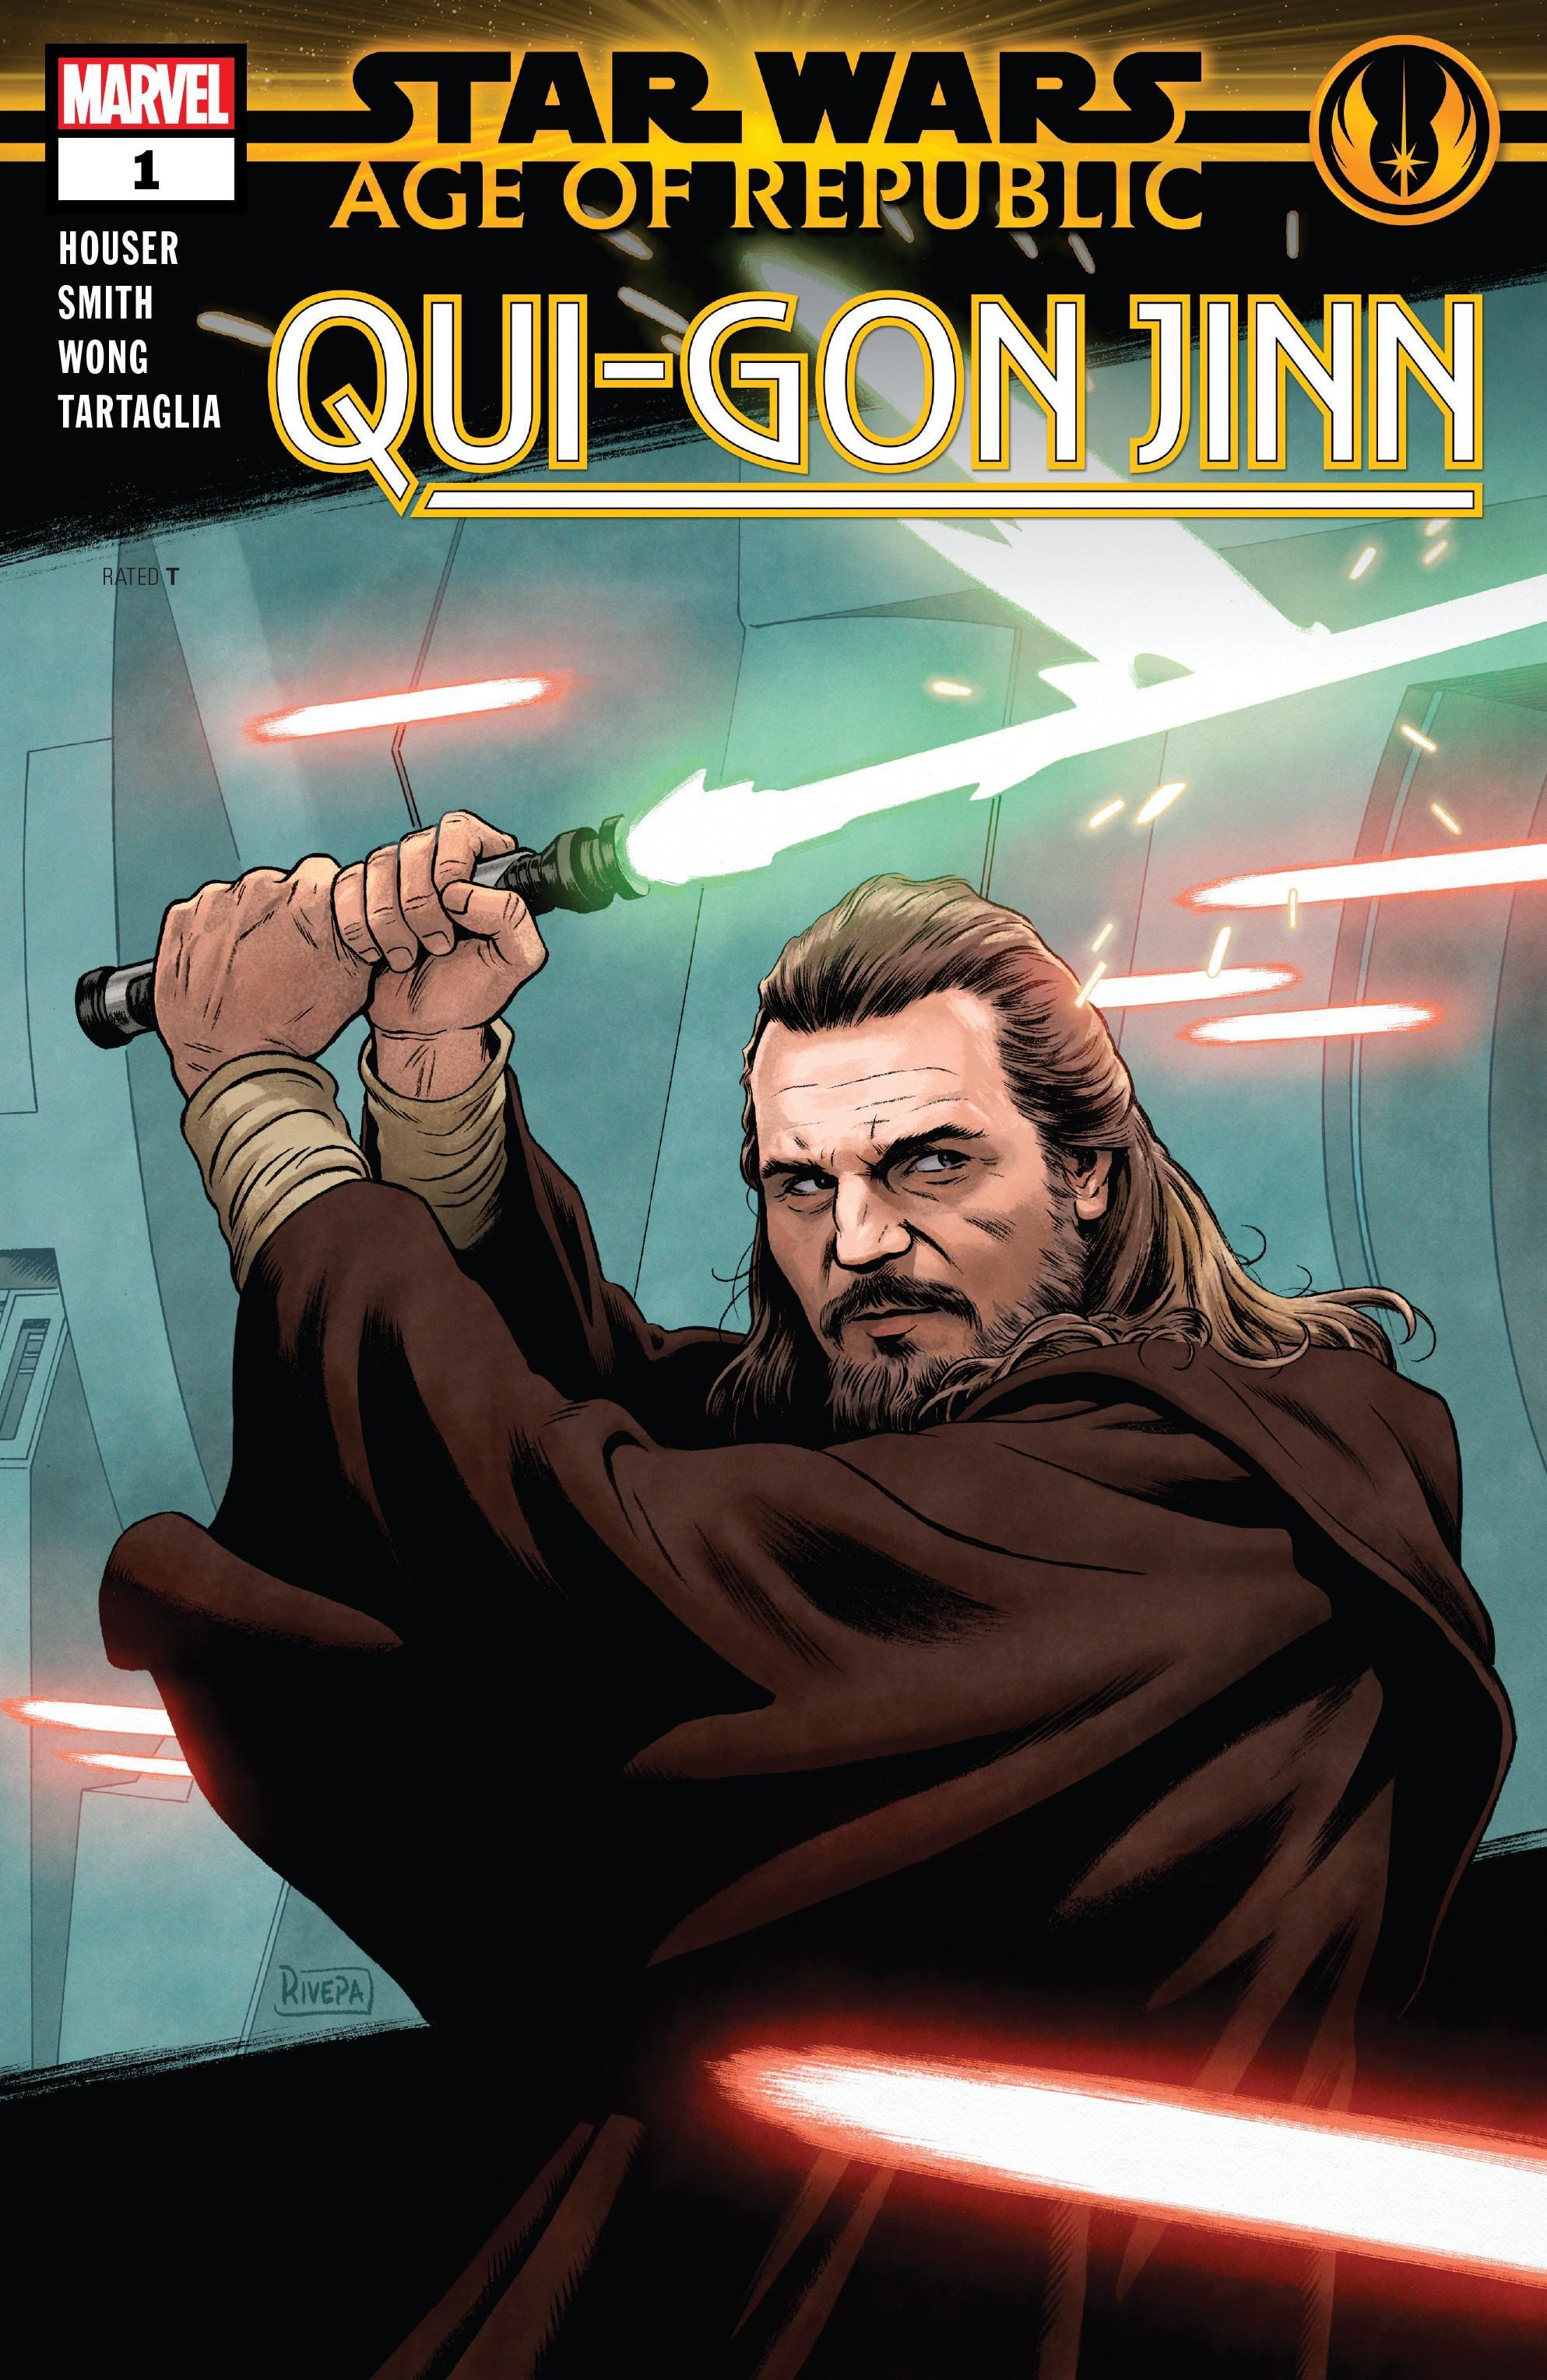 Star Wars Age of Republic Qui-Gon Jinn